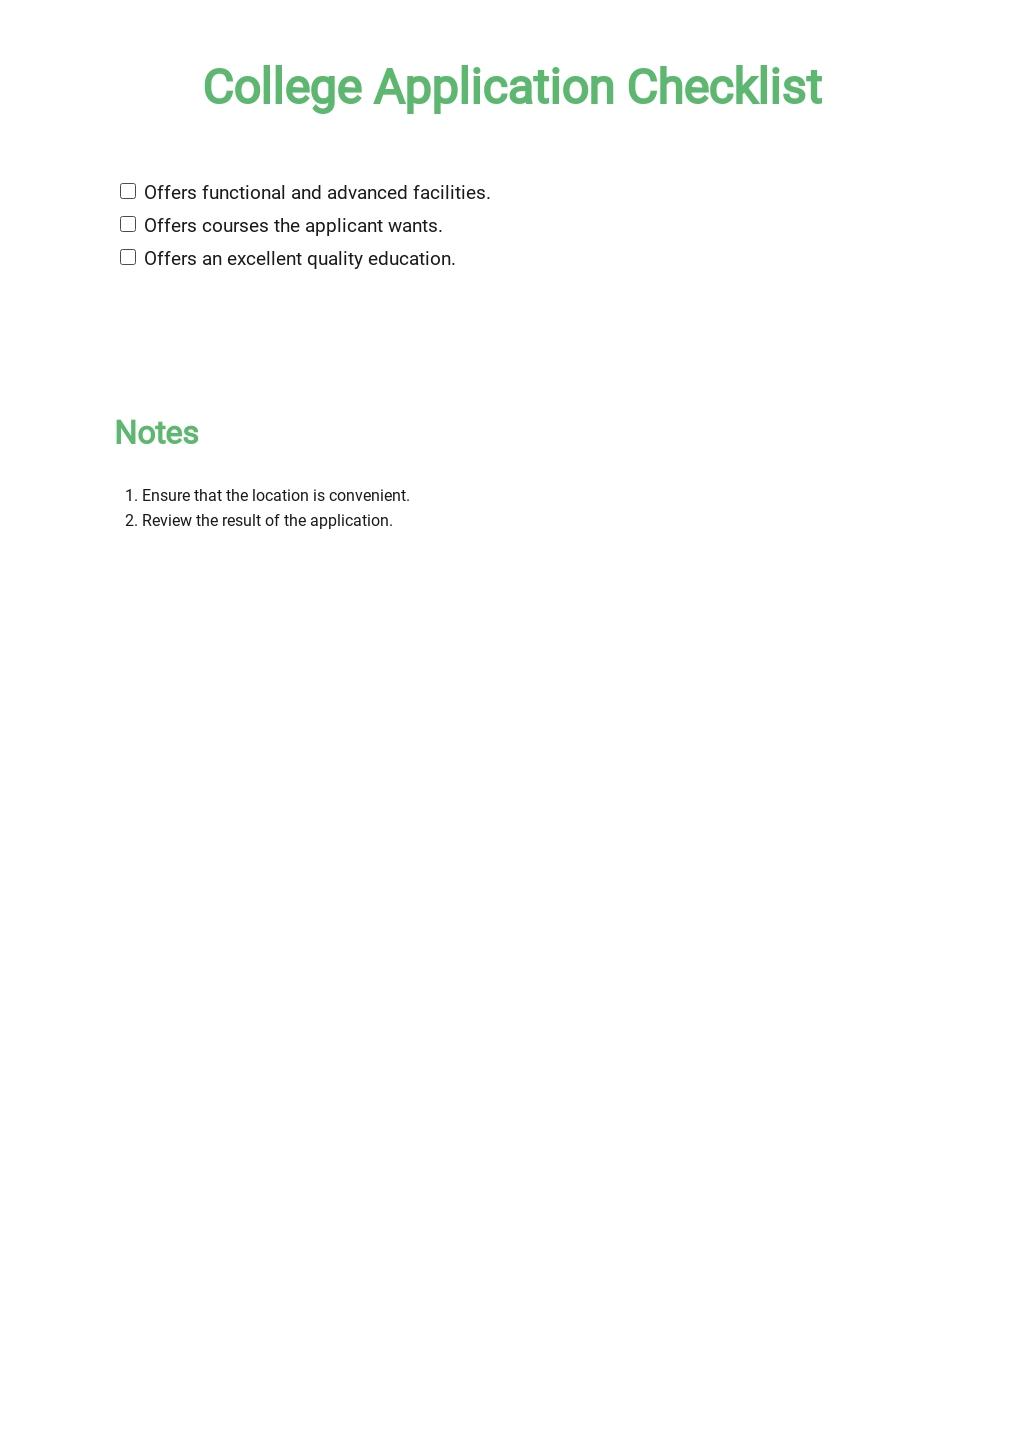 College Application Checklist Template.jpe